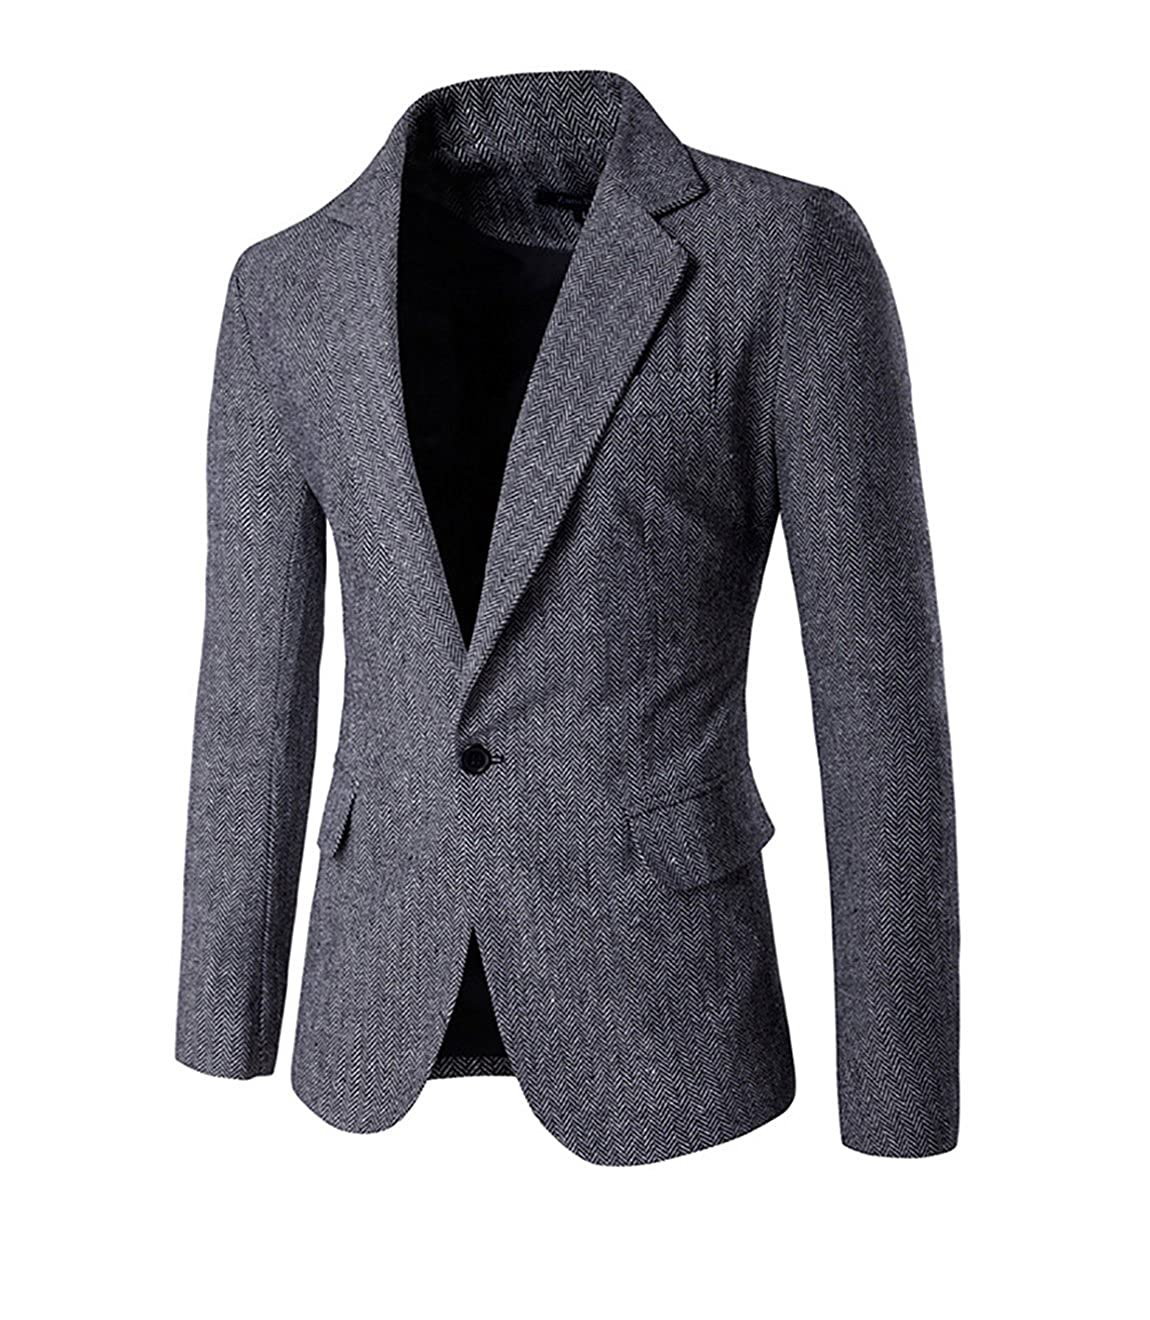 Slim Fit sportlich Herren Tweed Herringbone Blazer Sakko AW9283